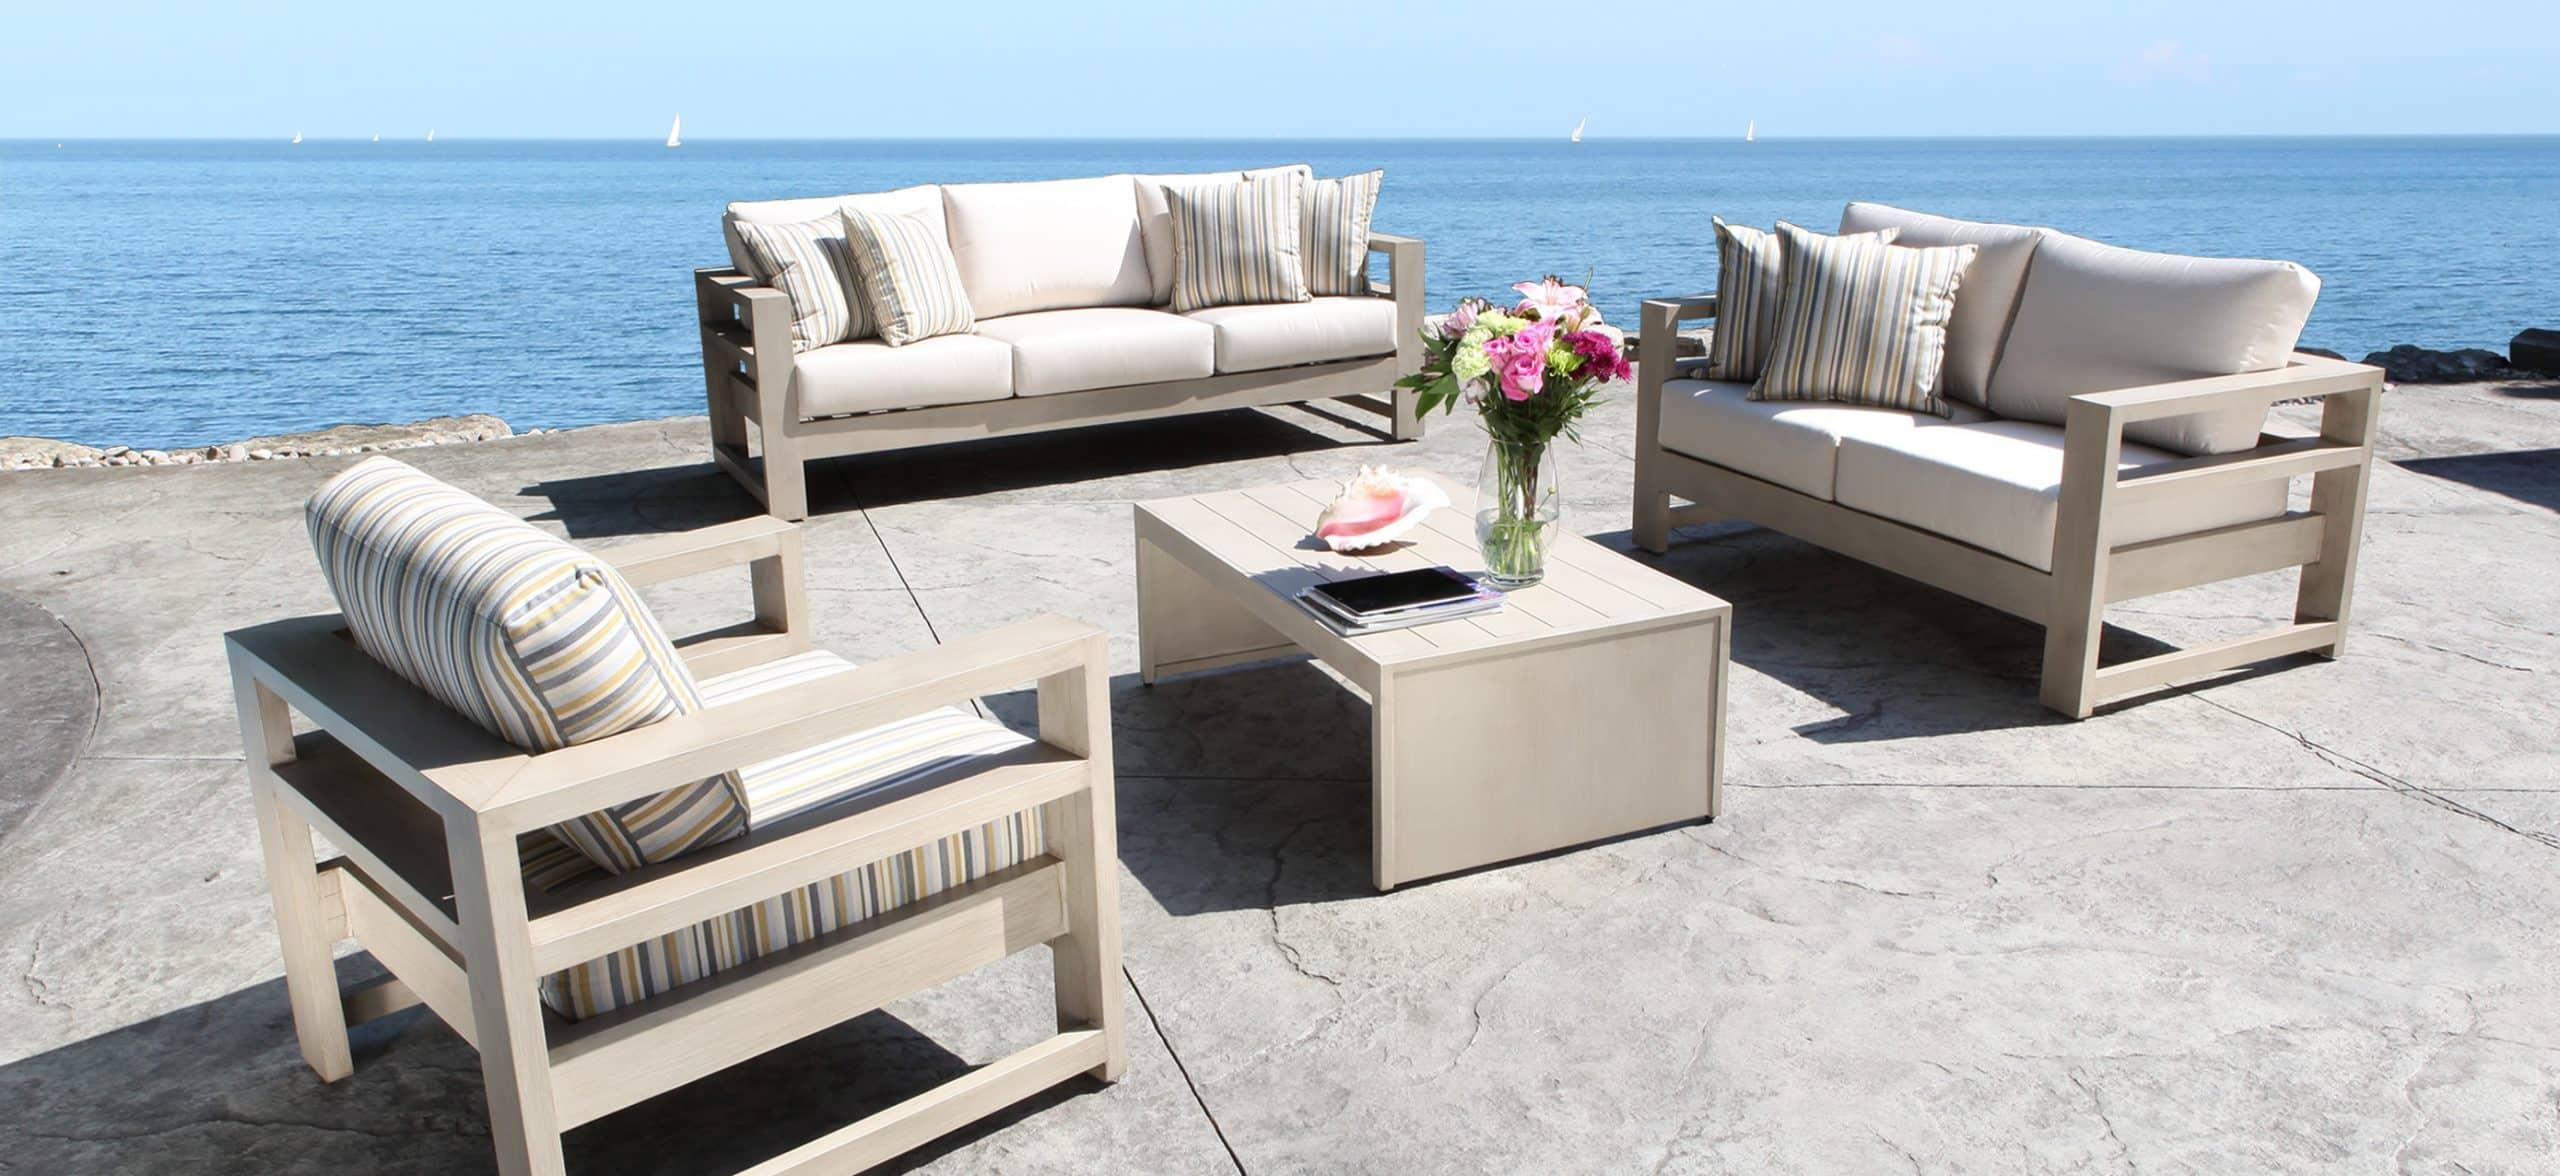 modern outdoor furniture ideas designbump -